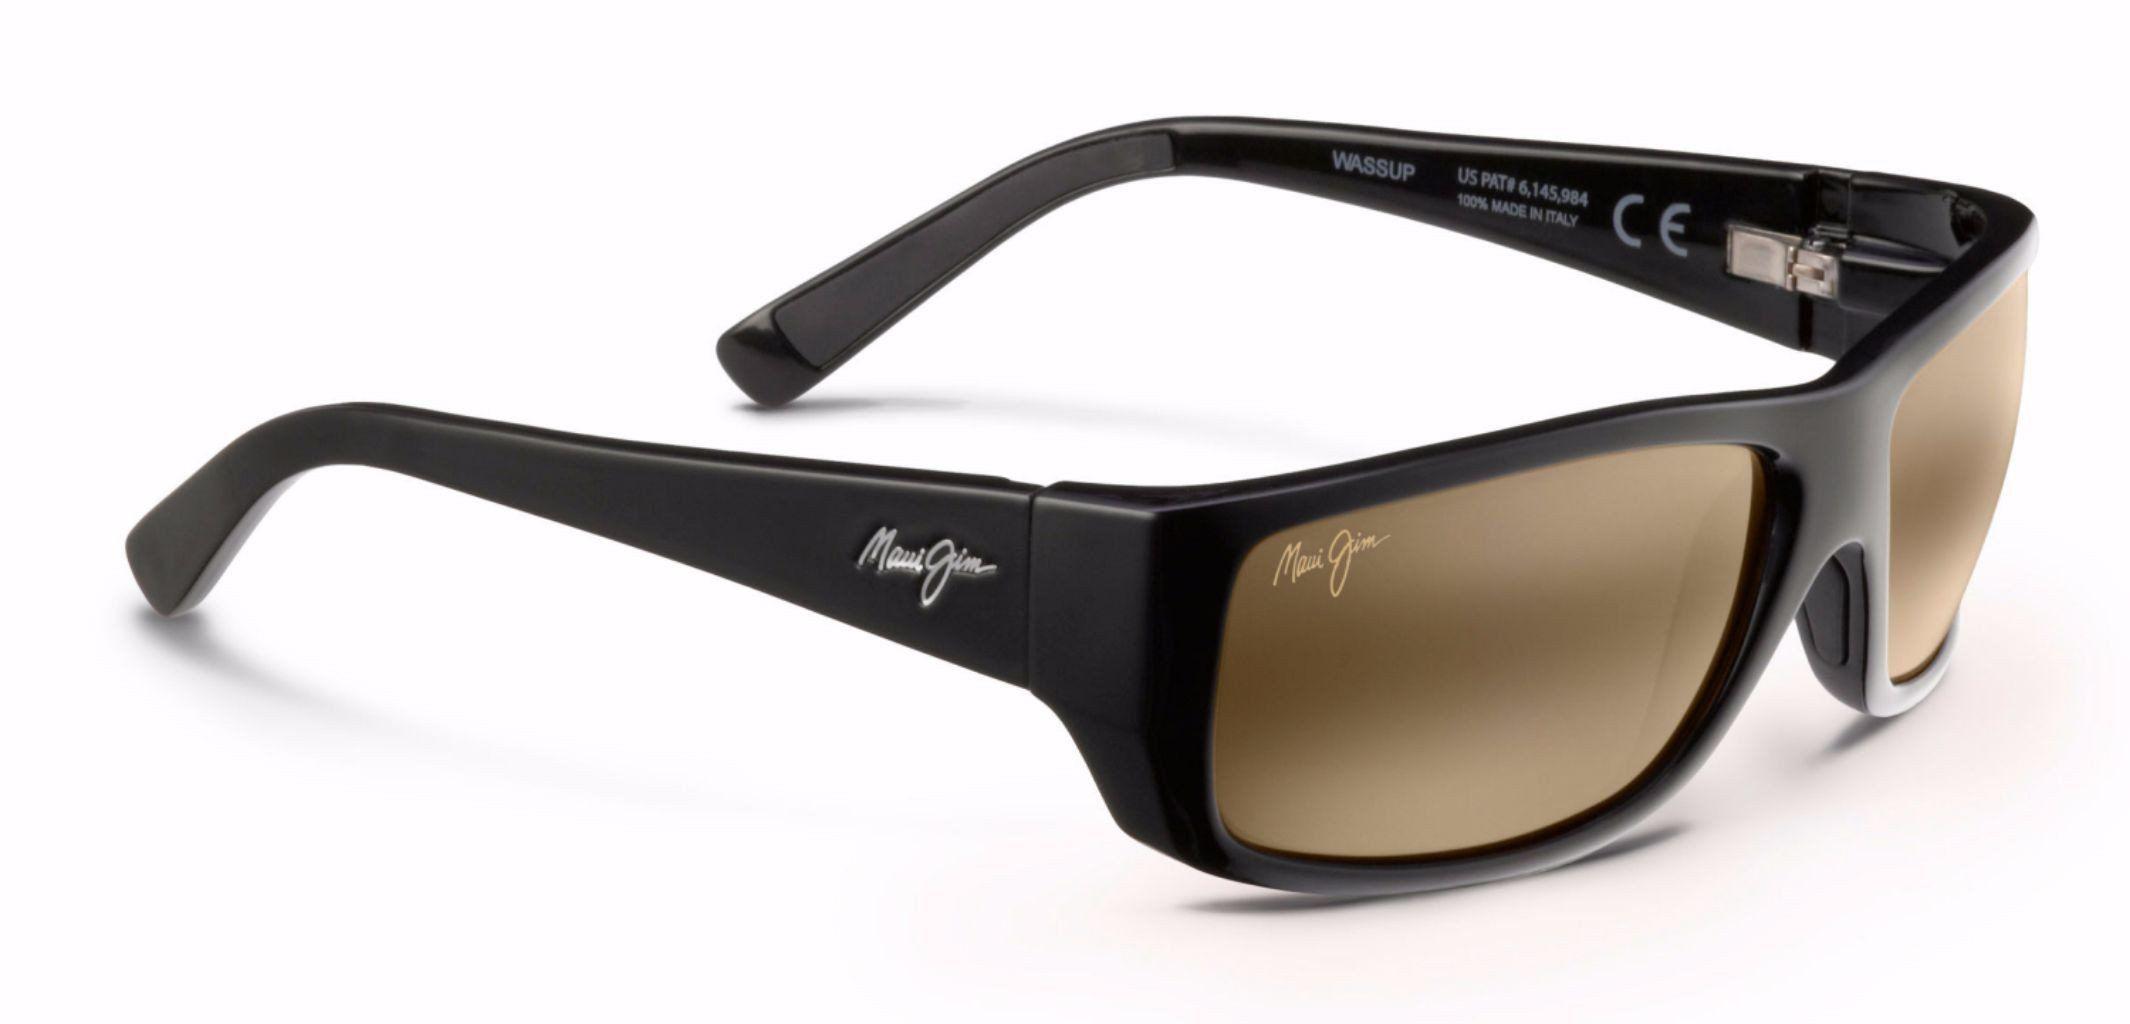 093c81c0dc Maui Jim Wassup 123 Sunglasses